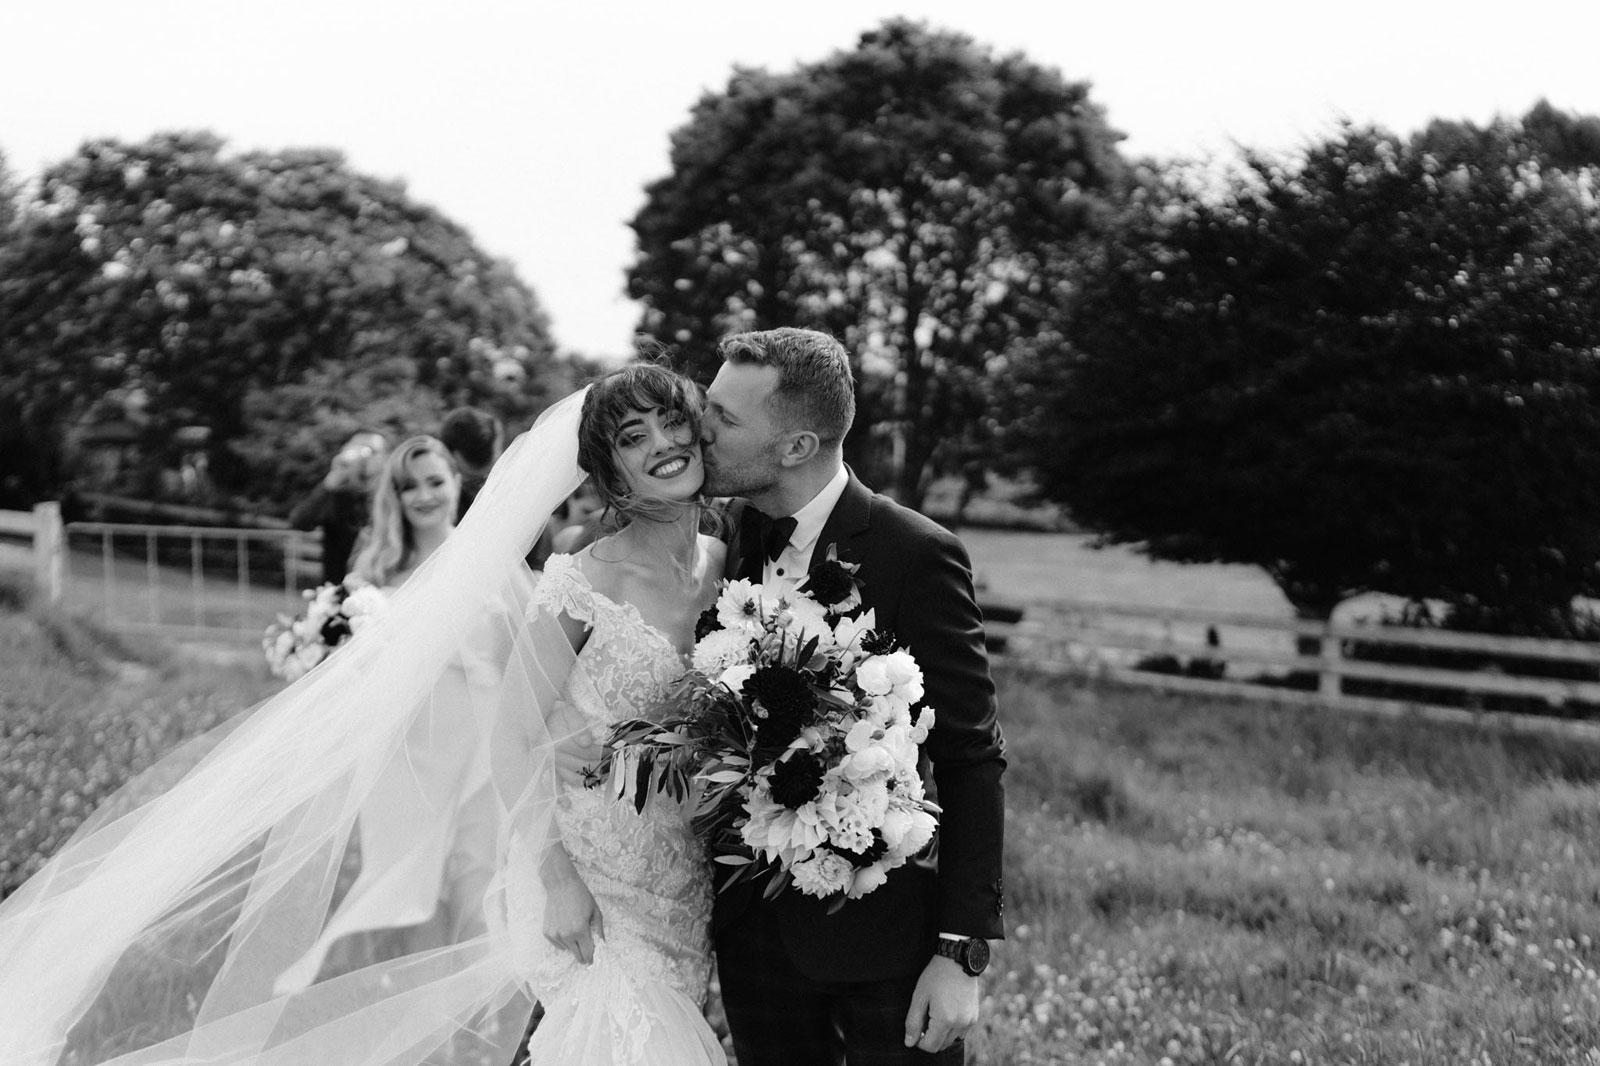 newfound-n-c-olive-tree-cottage-tauranga-wedding-photographer-606